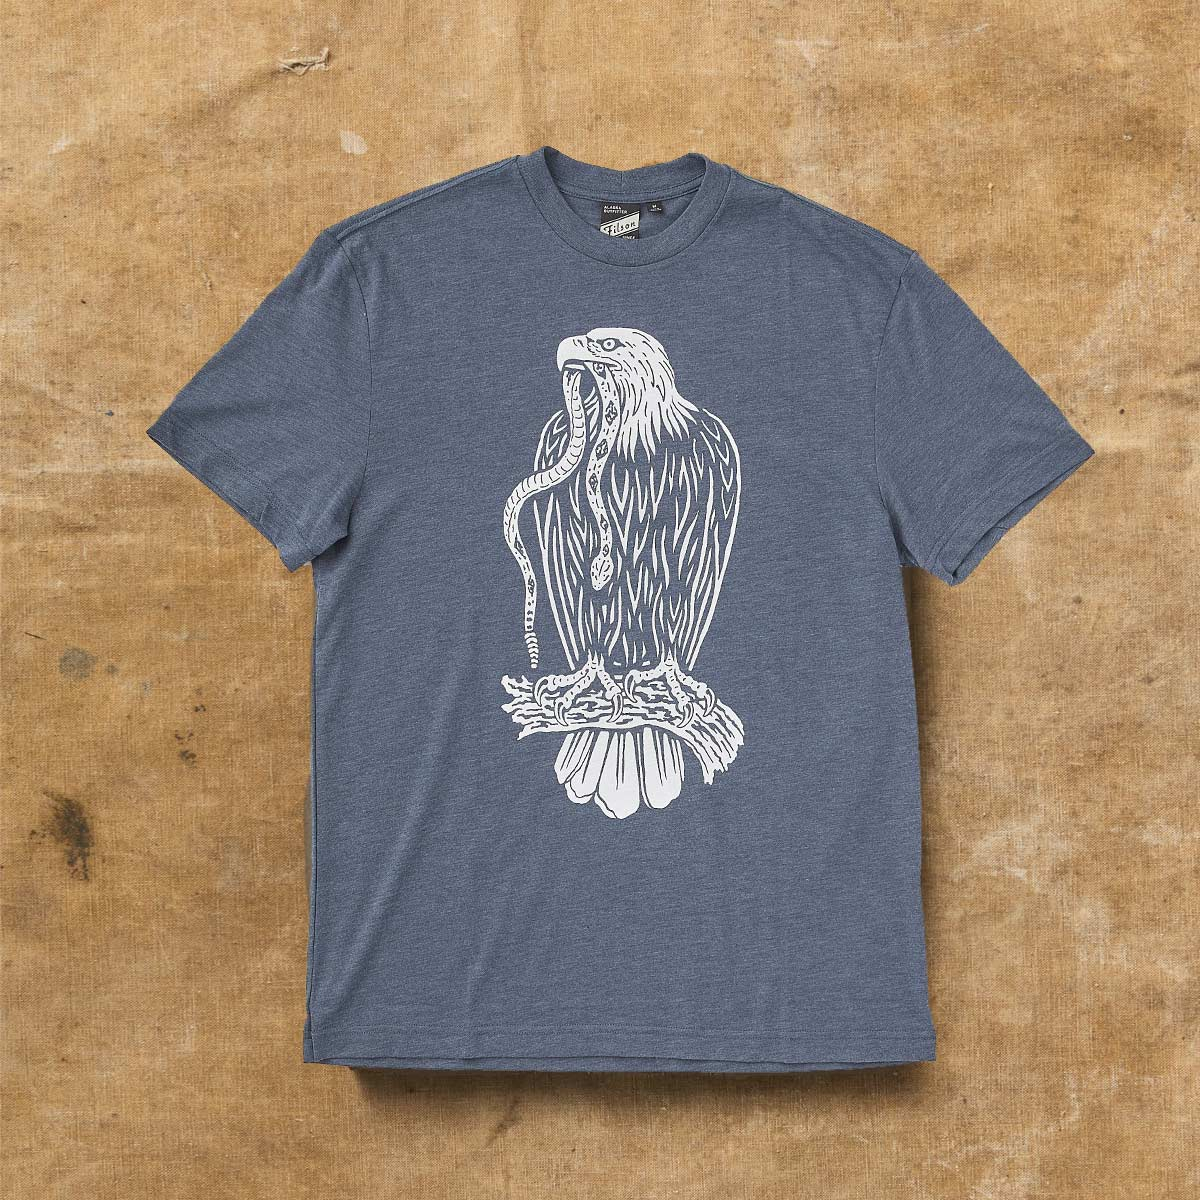 Filson Buckshot T-Shirt Navy Heather, hoogwaardig T-shirt met UPF 50+ zonwering